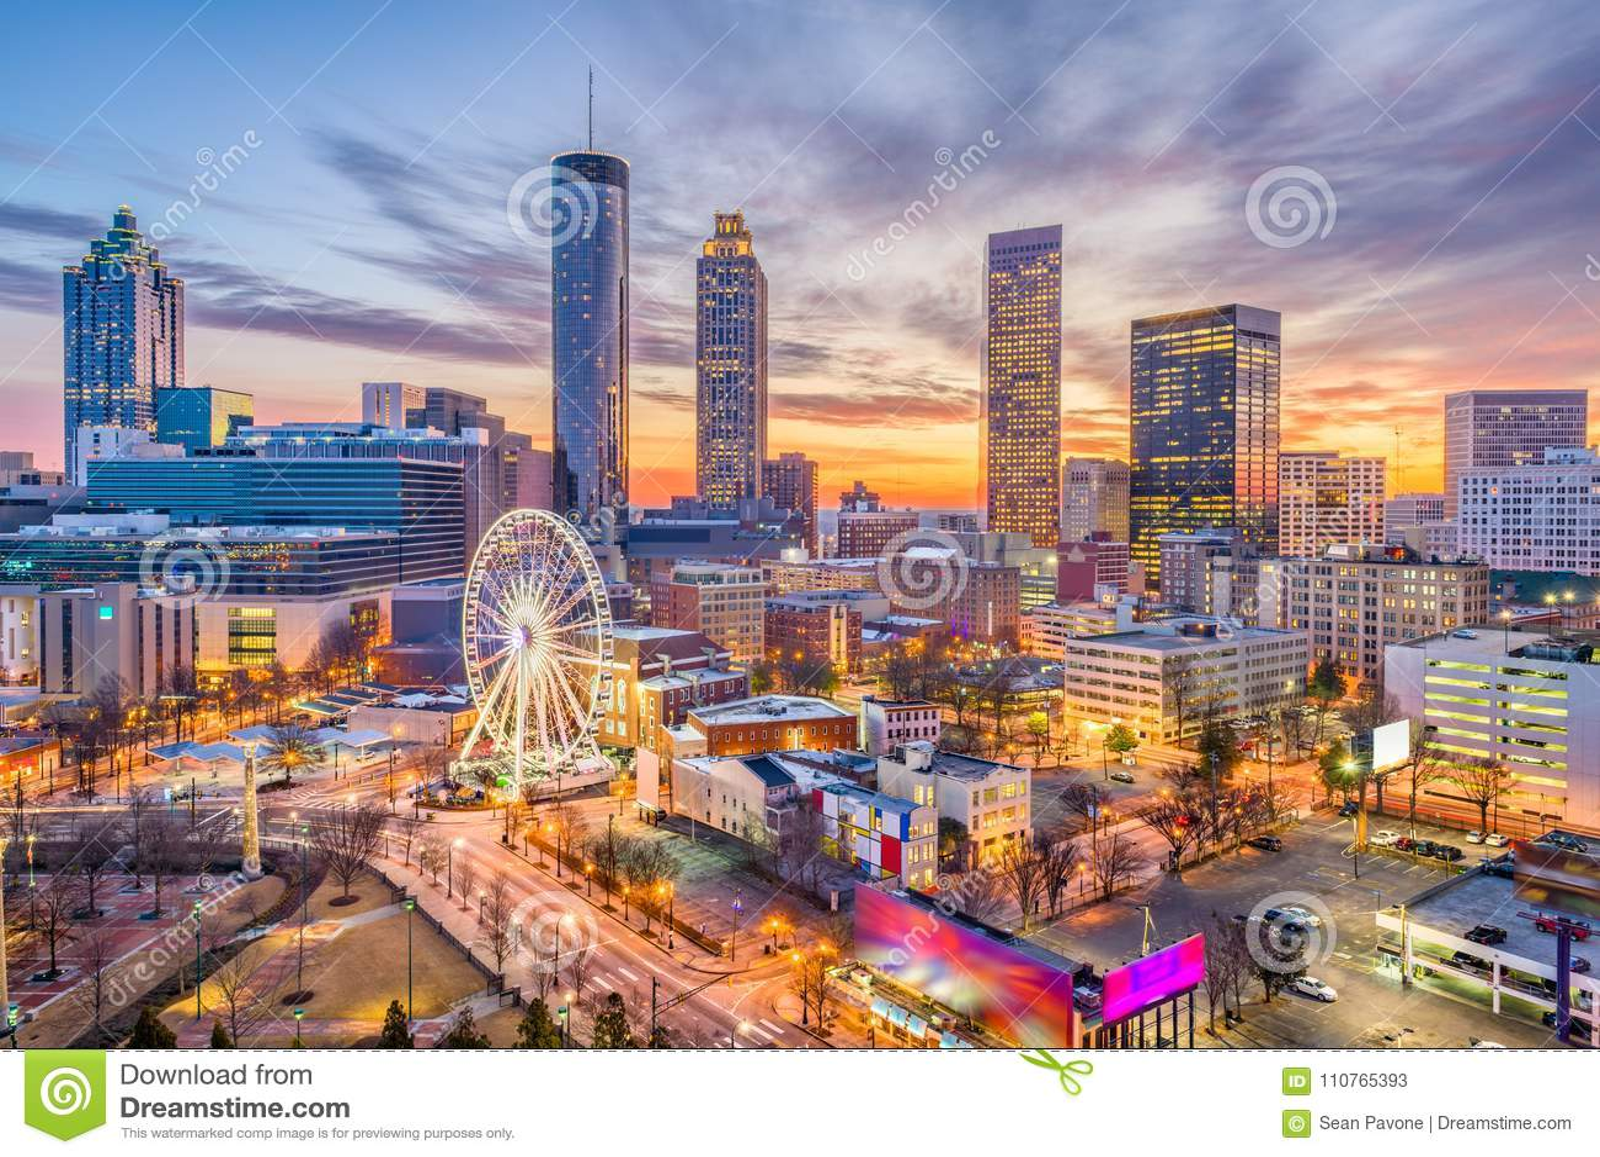 Atlanta Georgia, USA